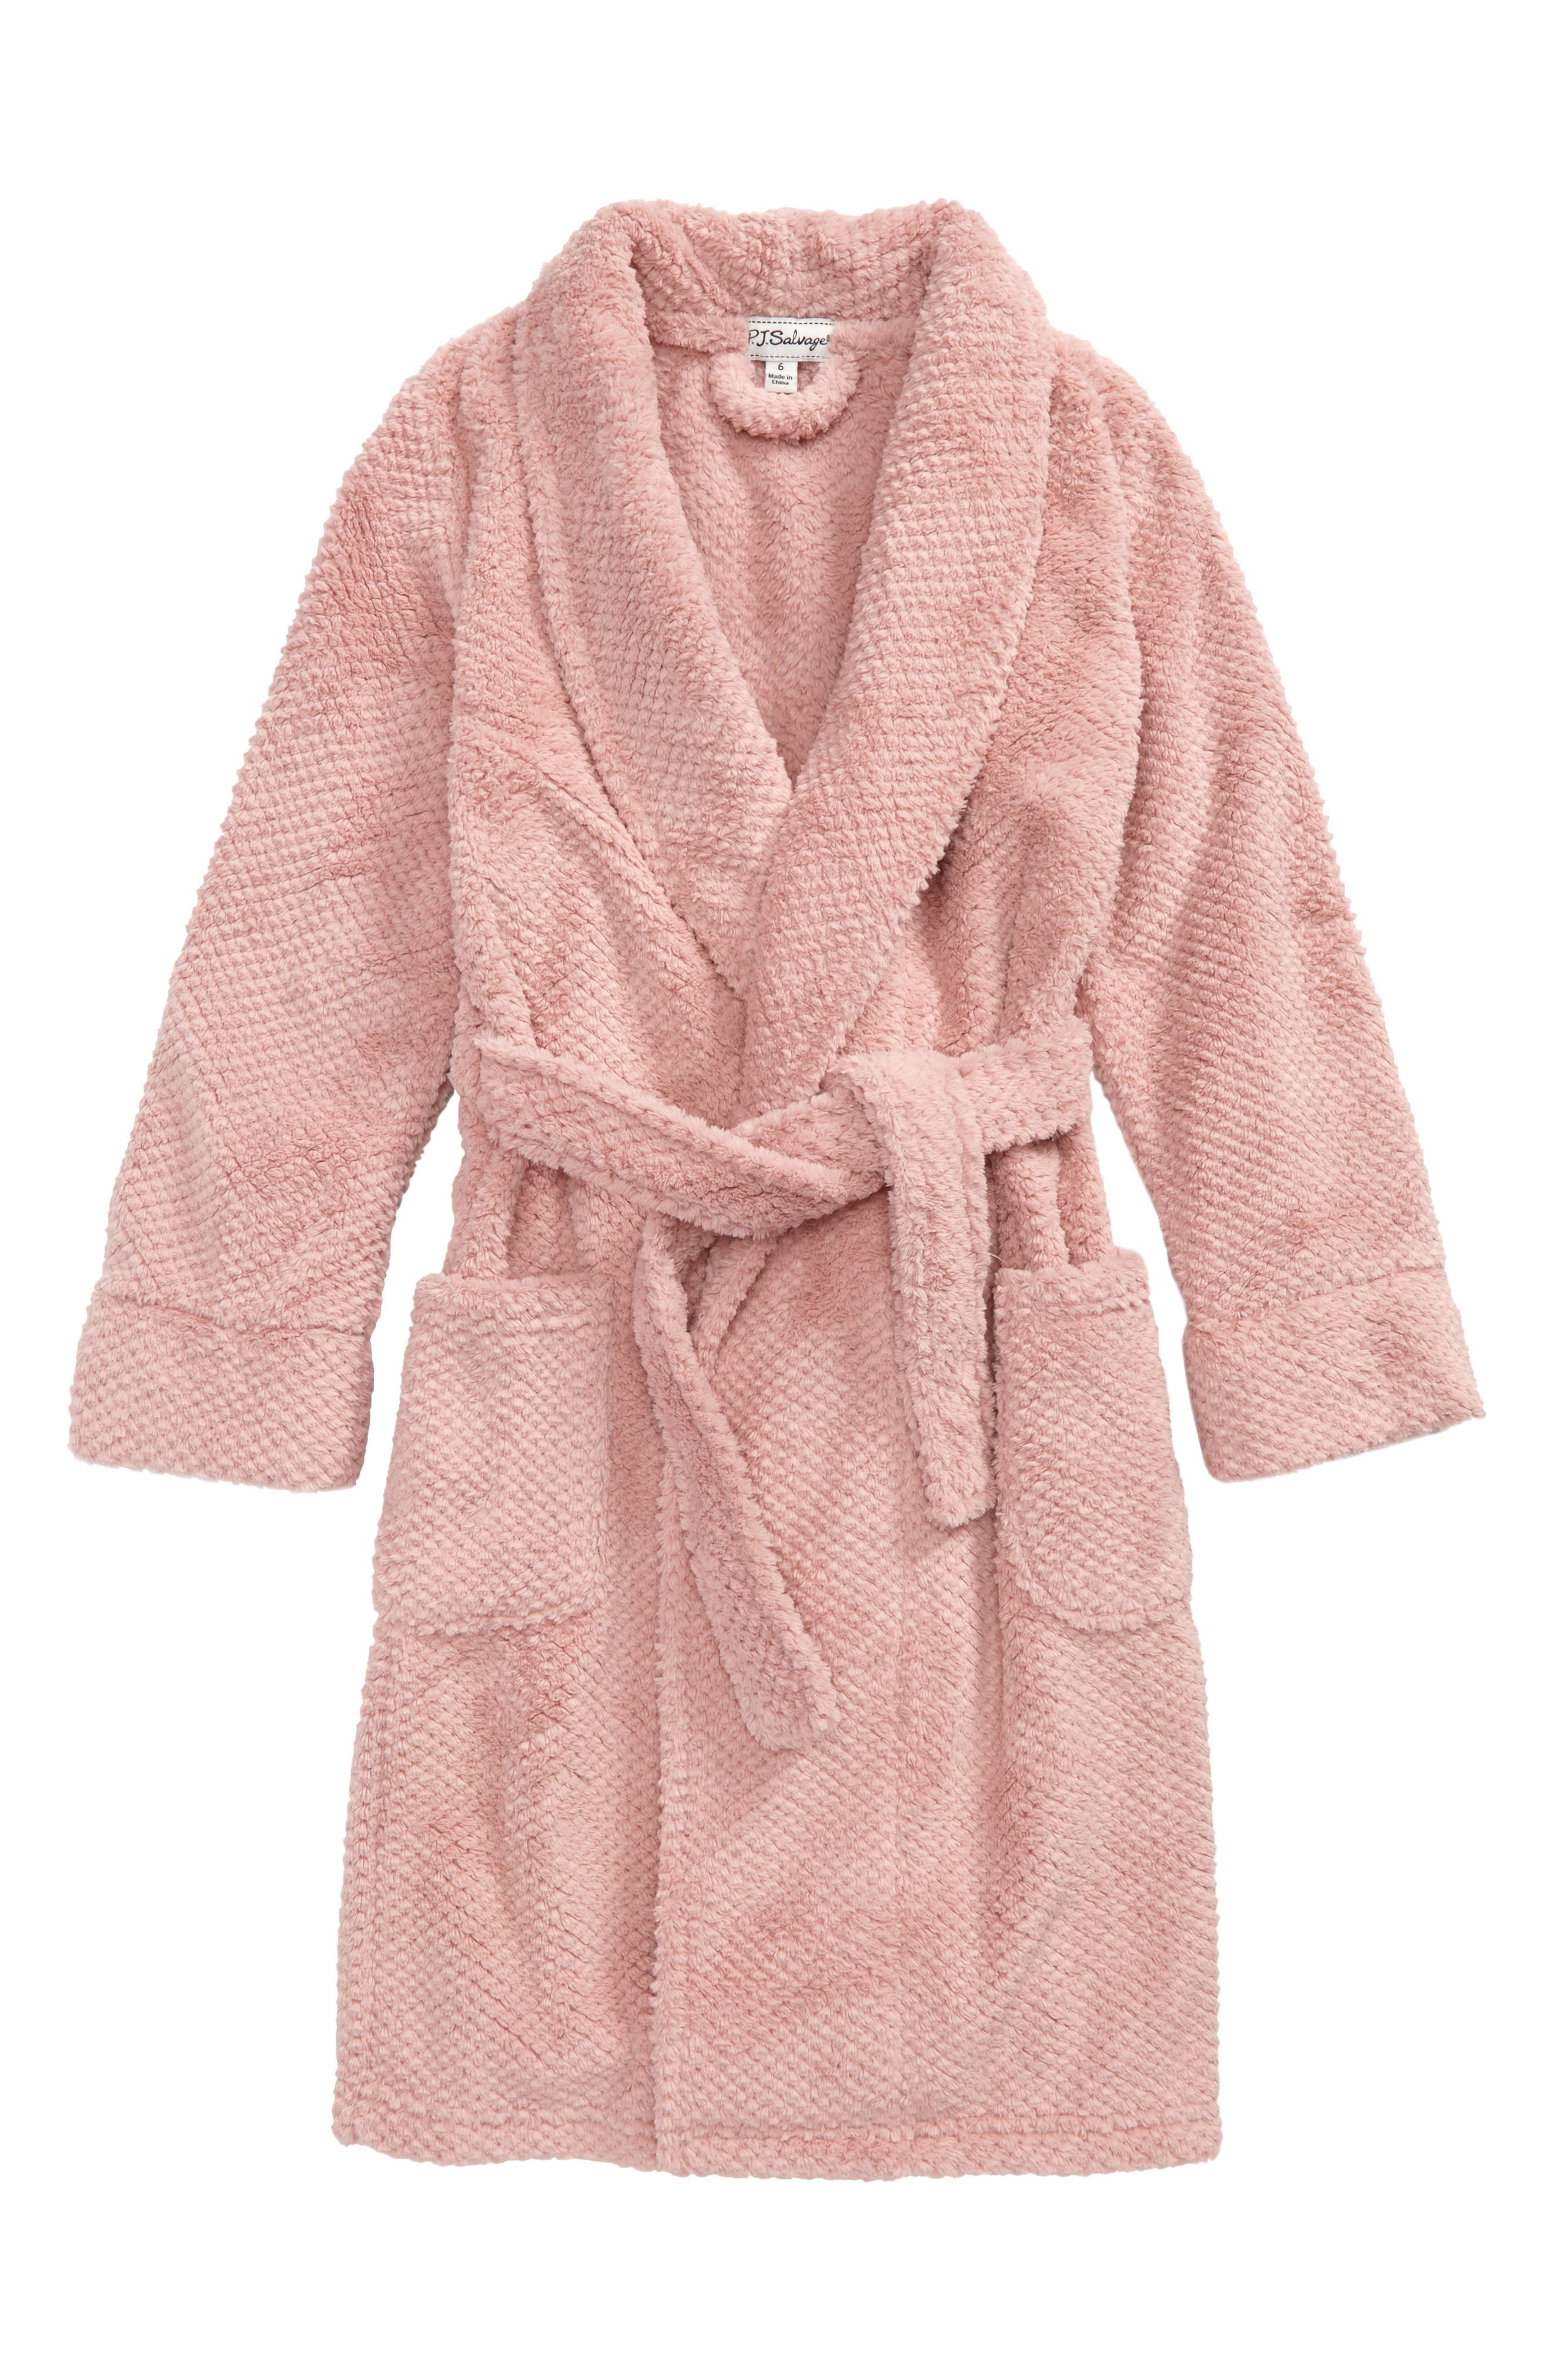 PJ Salvage Waffle Weave Robe (Toddler Girls, Little Girls & Big Girls)